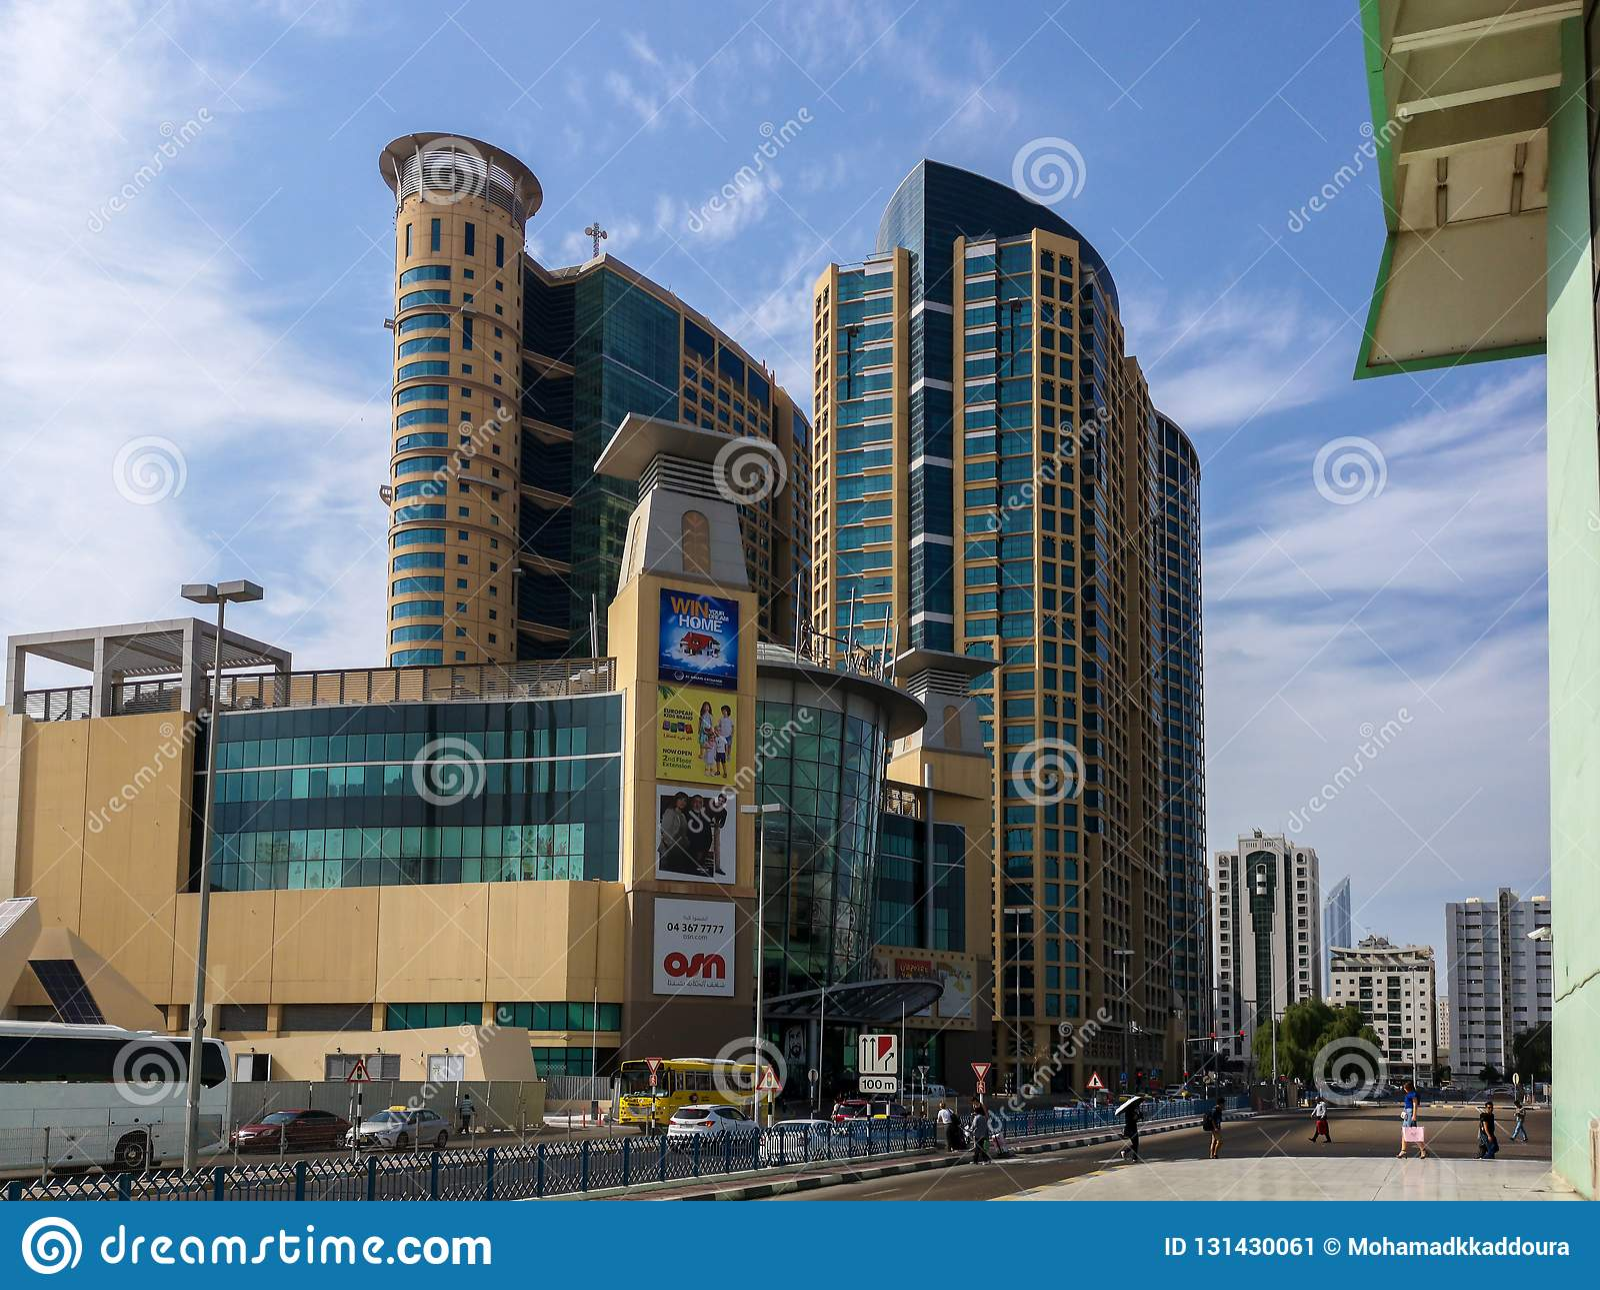 Shot Of Abu Dhabi City Al Wahda Mall On A Cloudy Day